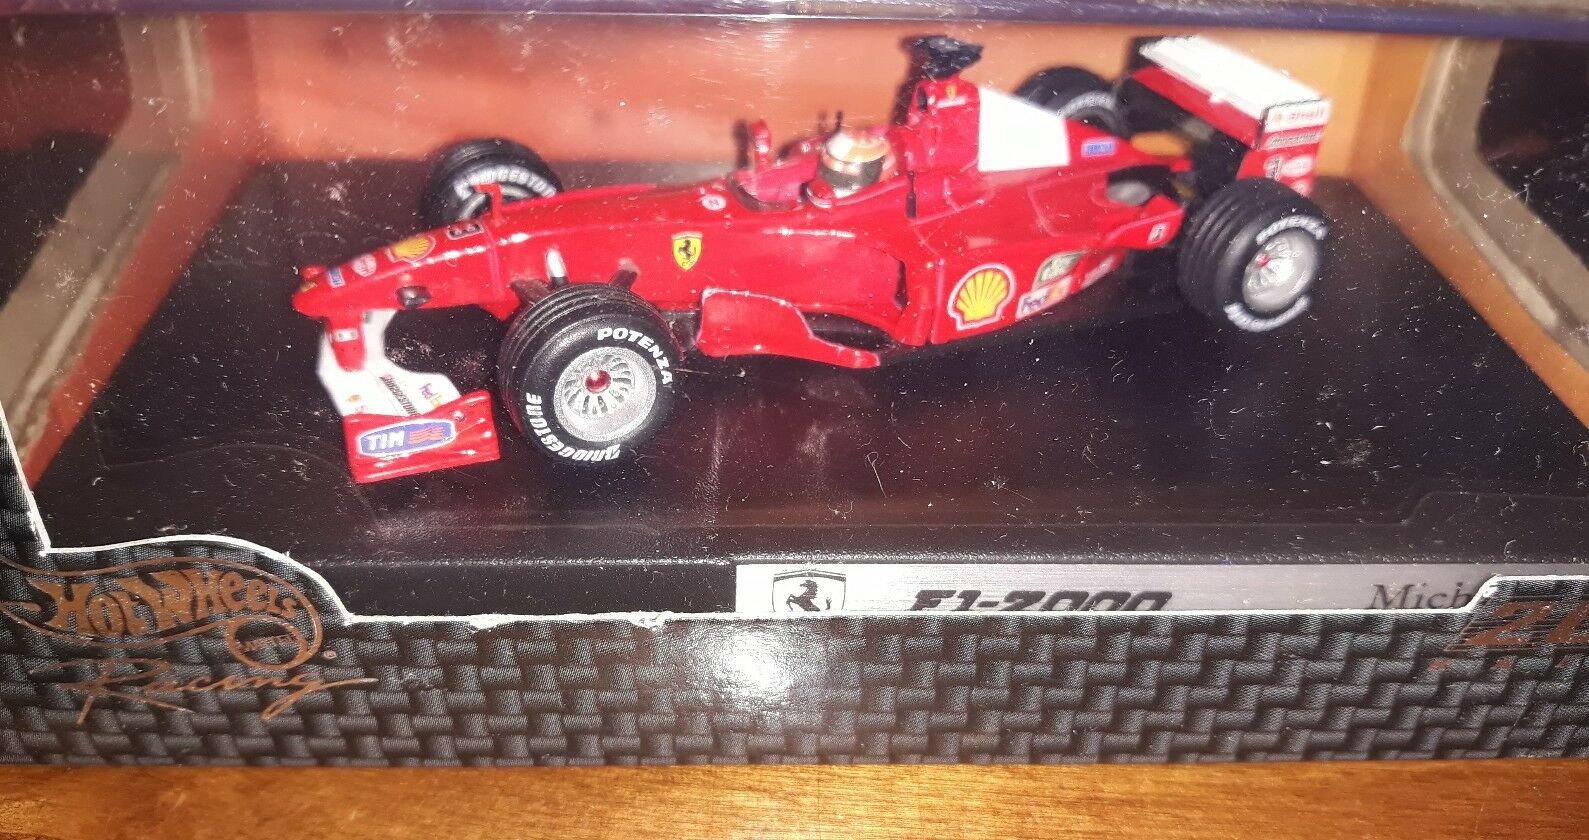 Hot Wheels 1 43 Ferrari F1-2000  3 M.Schumacher World Champion